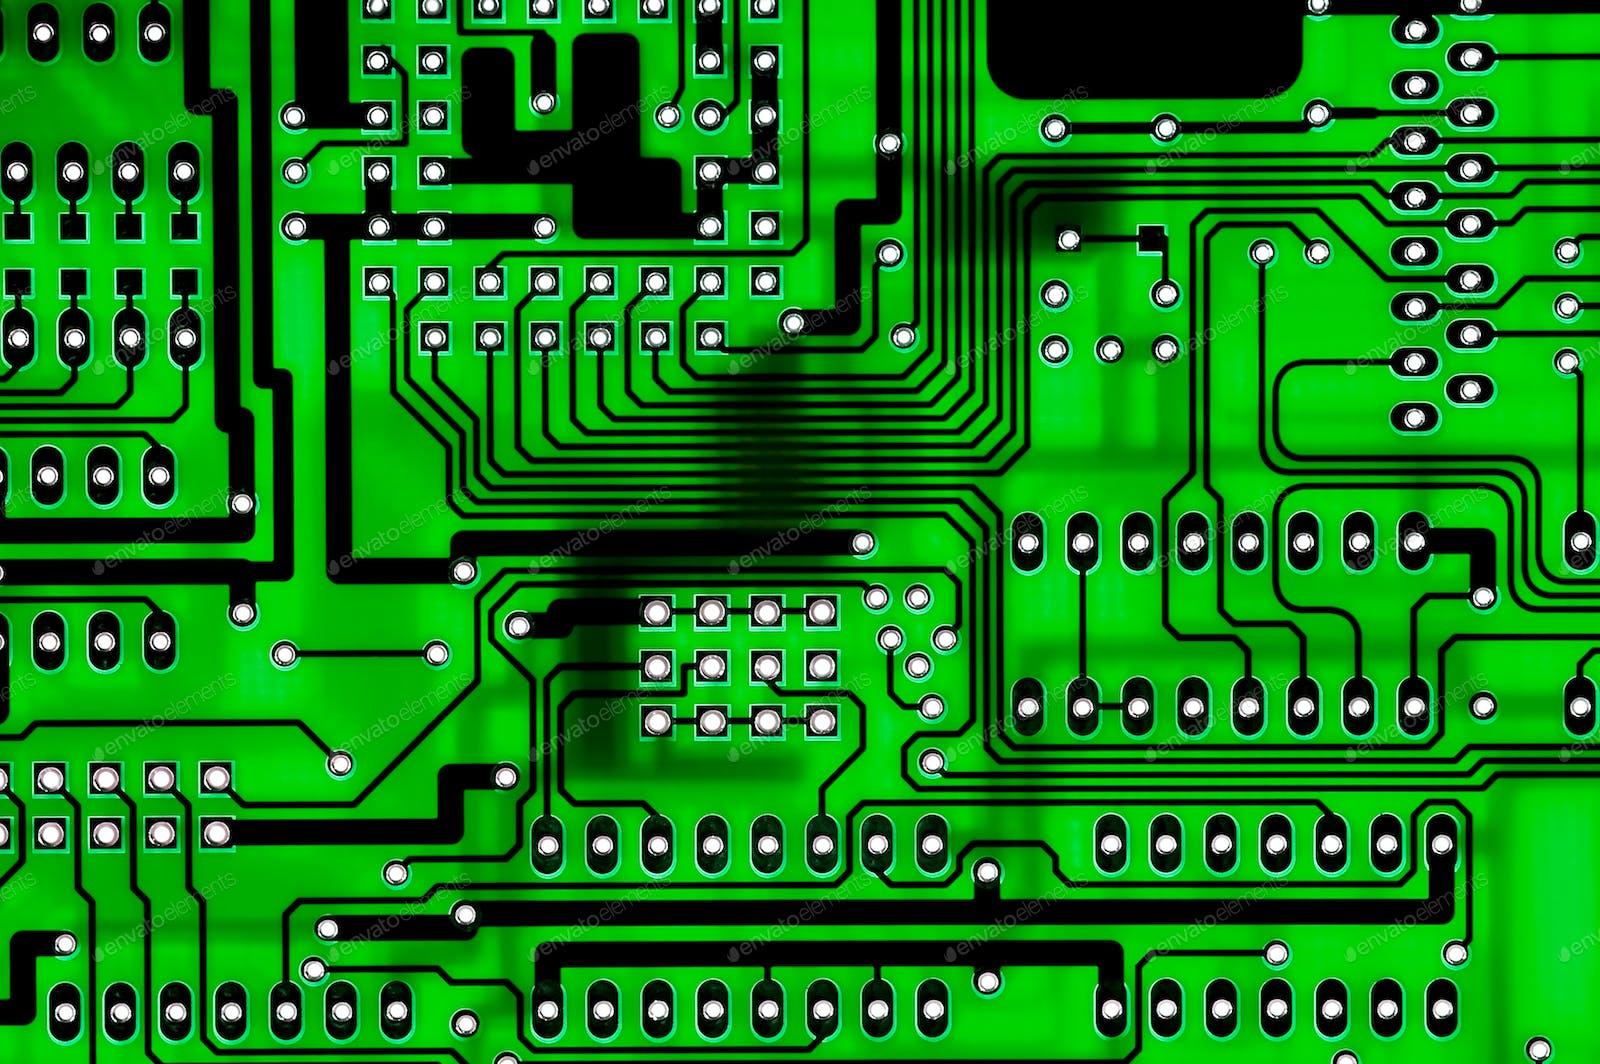 Download 3 Circuit Board Photos Envato Elements Circuitboard